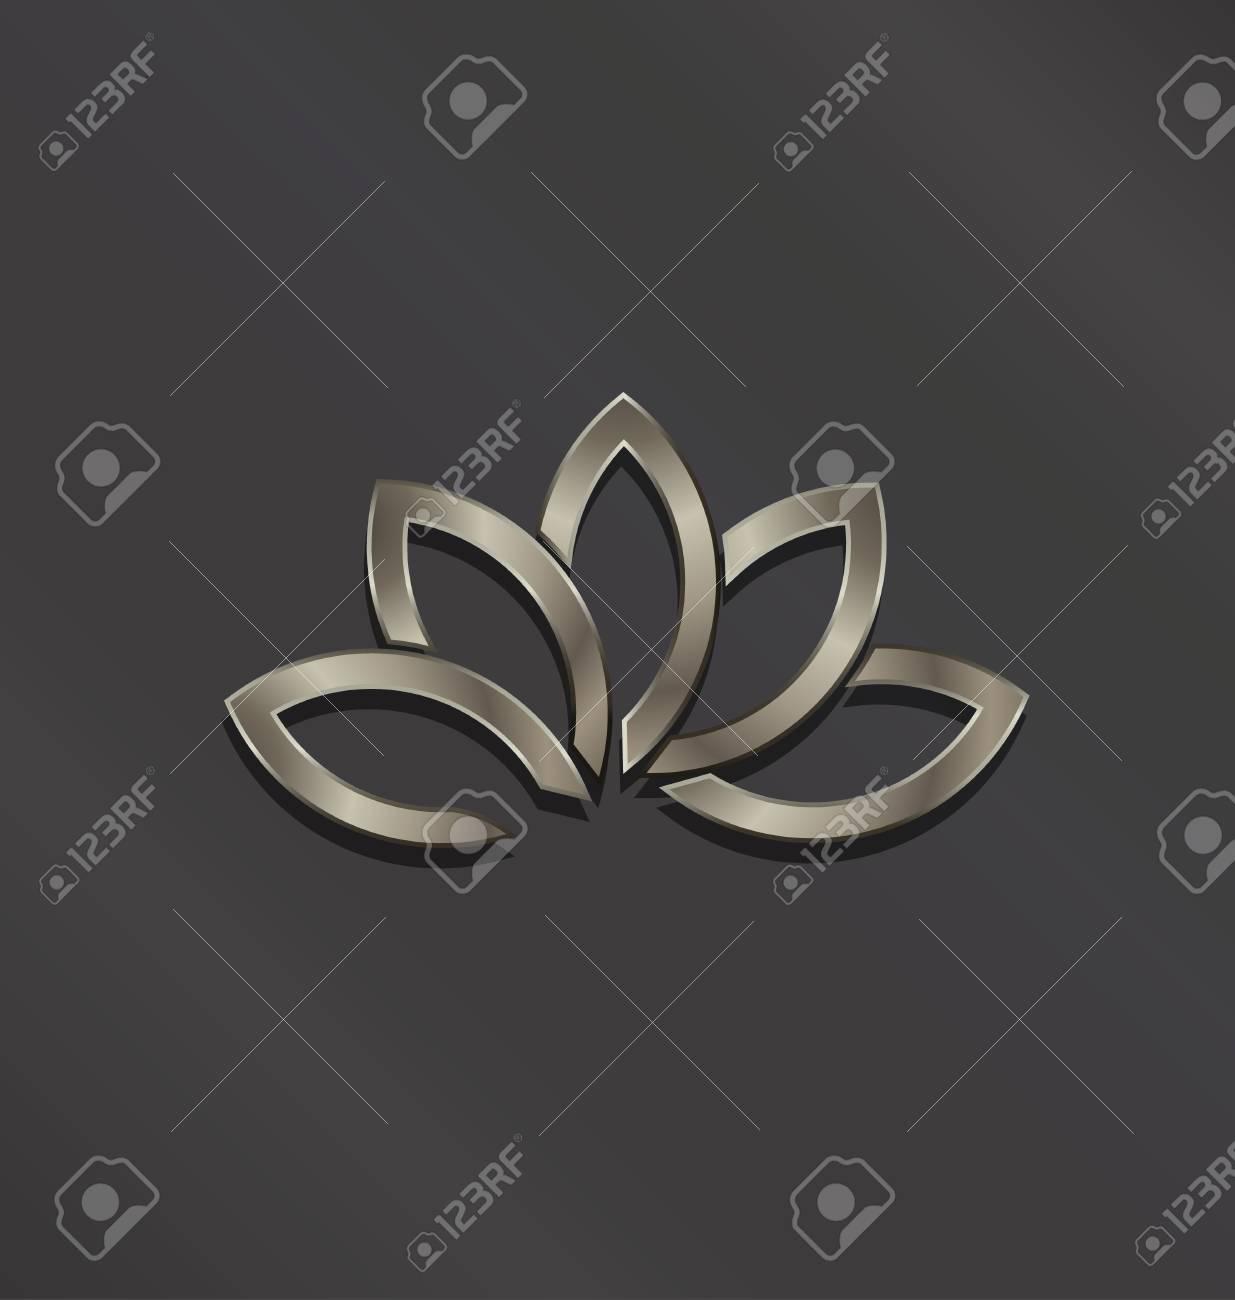 Platinum lotus flower logo vector icon stock photo picture and platinum lotus flower logo vector icon stock photo 99836912 izmirmasajfo